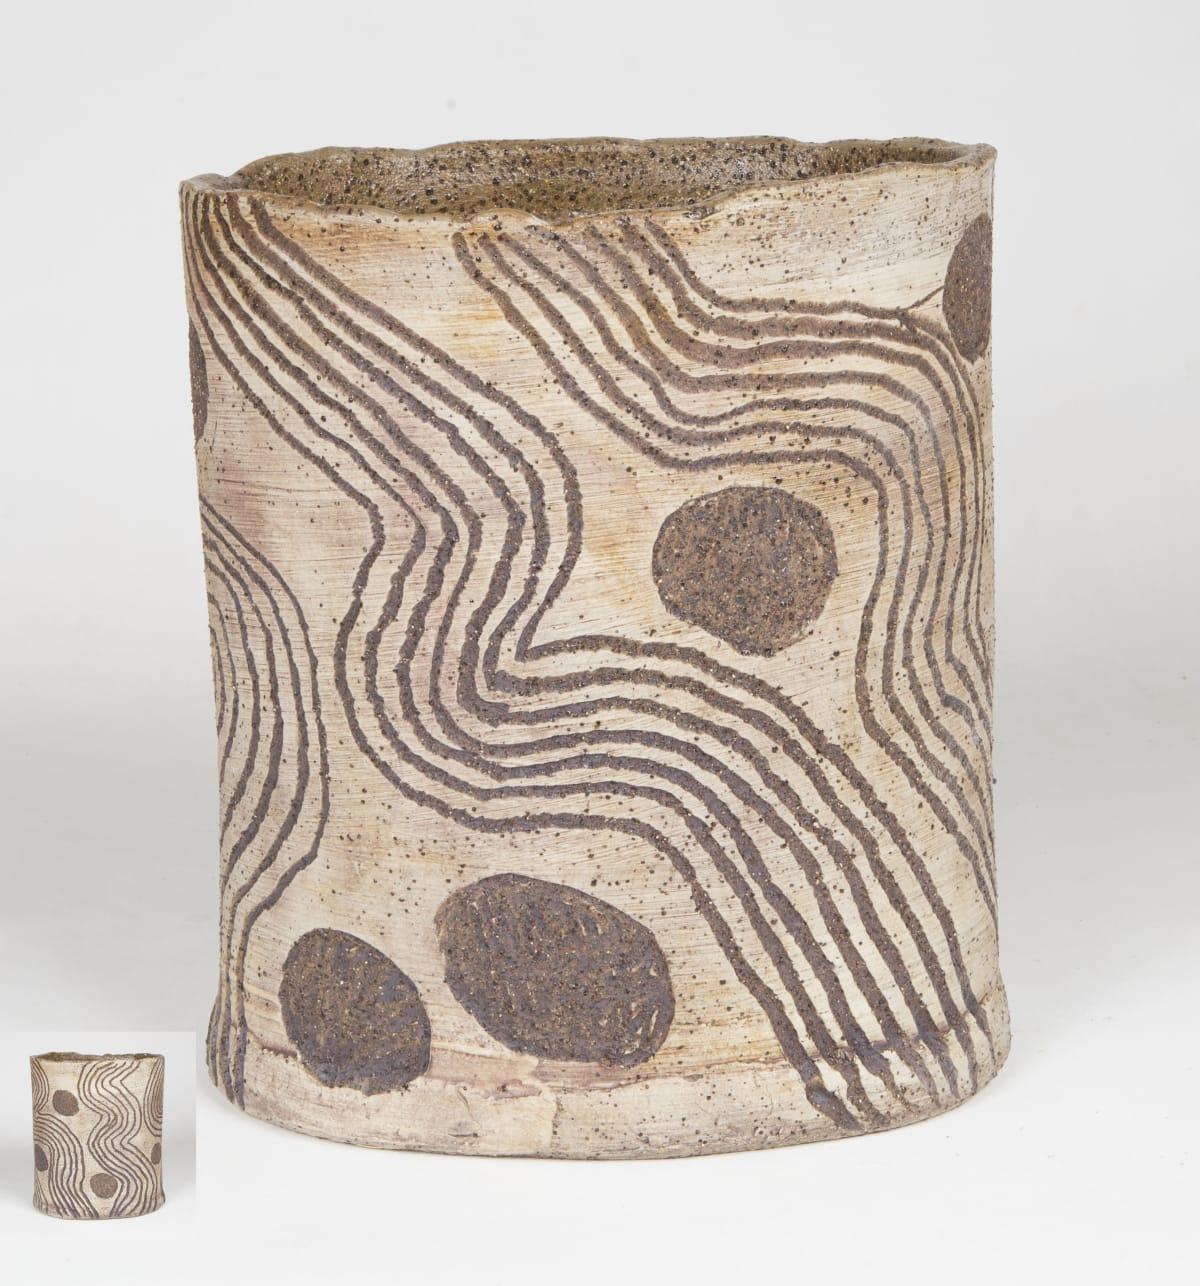 Rupert Jack Maku Maku, 2018 Stoneware 28 x 23 cm